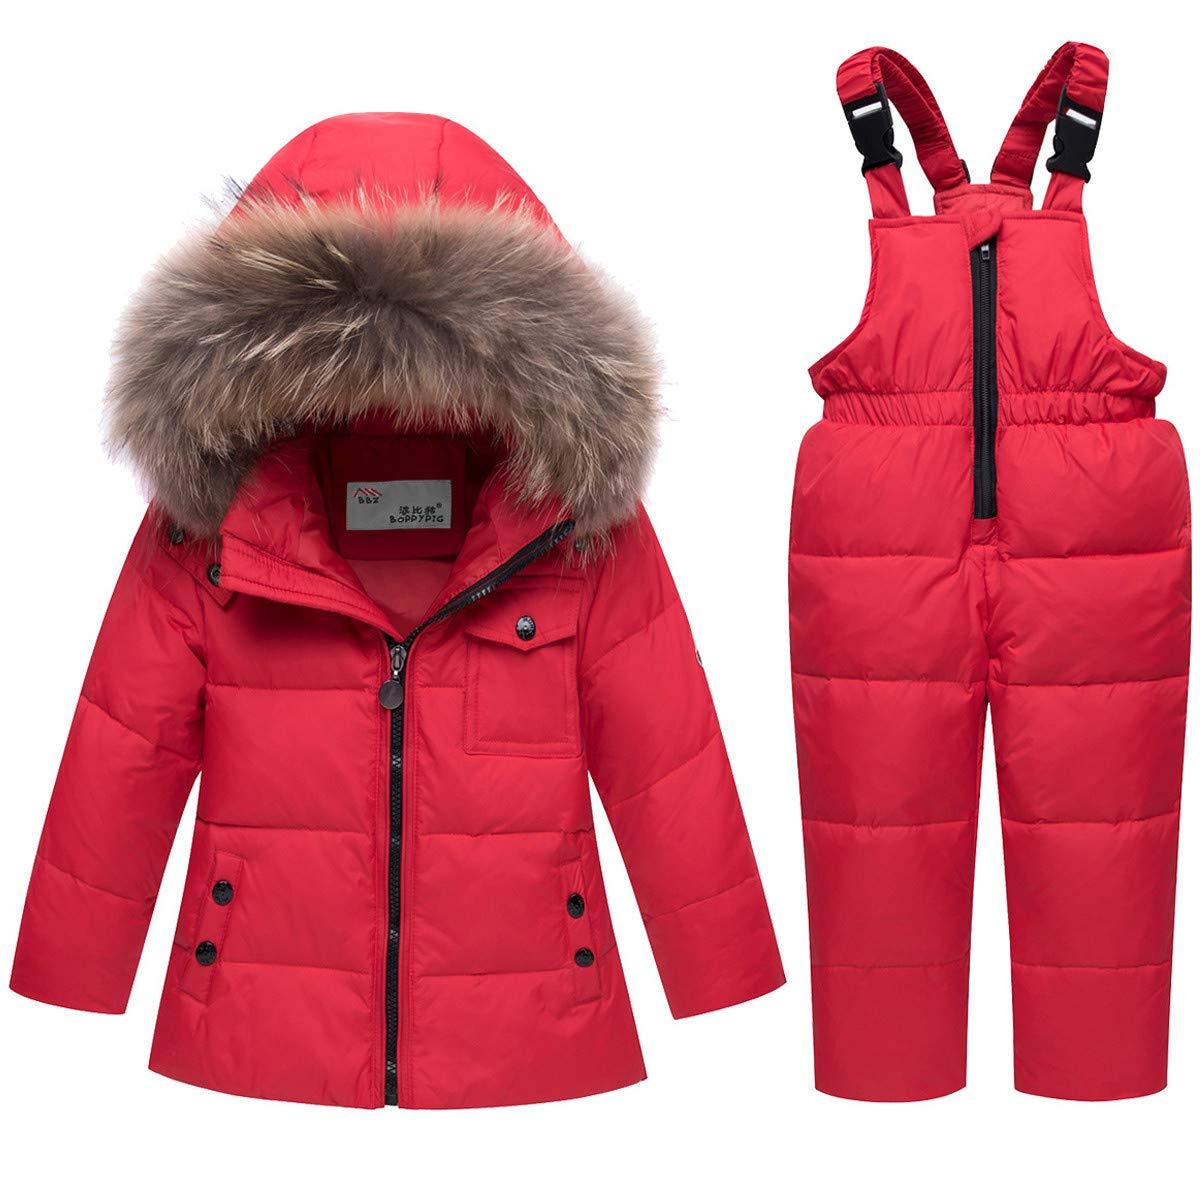 JELEUON Baby Girls and Boys Winter Warm Hooded Fur Trim Zipper Snowsuit Puffer Down Jacket with Snow Ski Bib Pants 6-7 Years by JELEUON